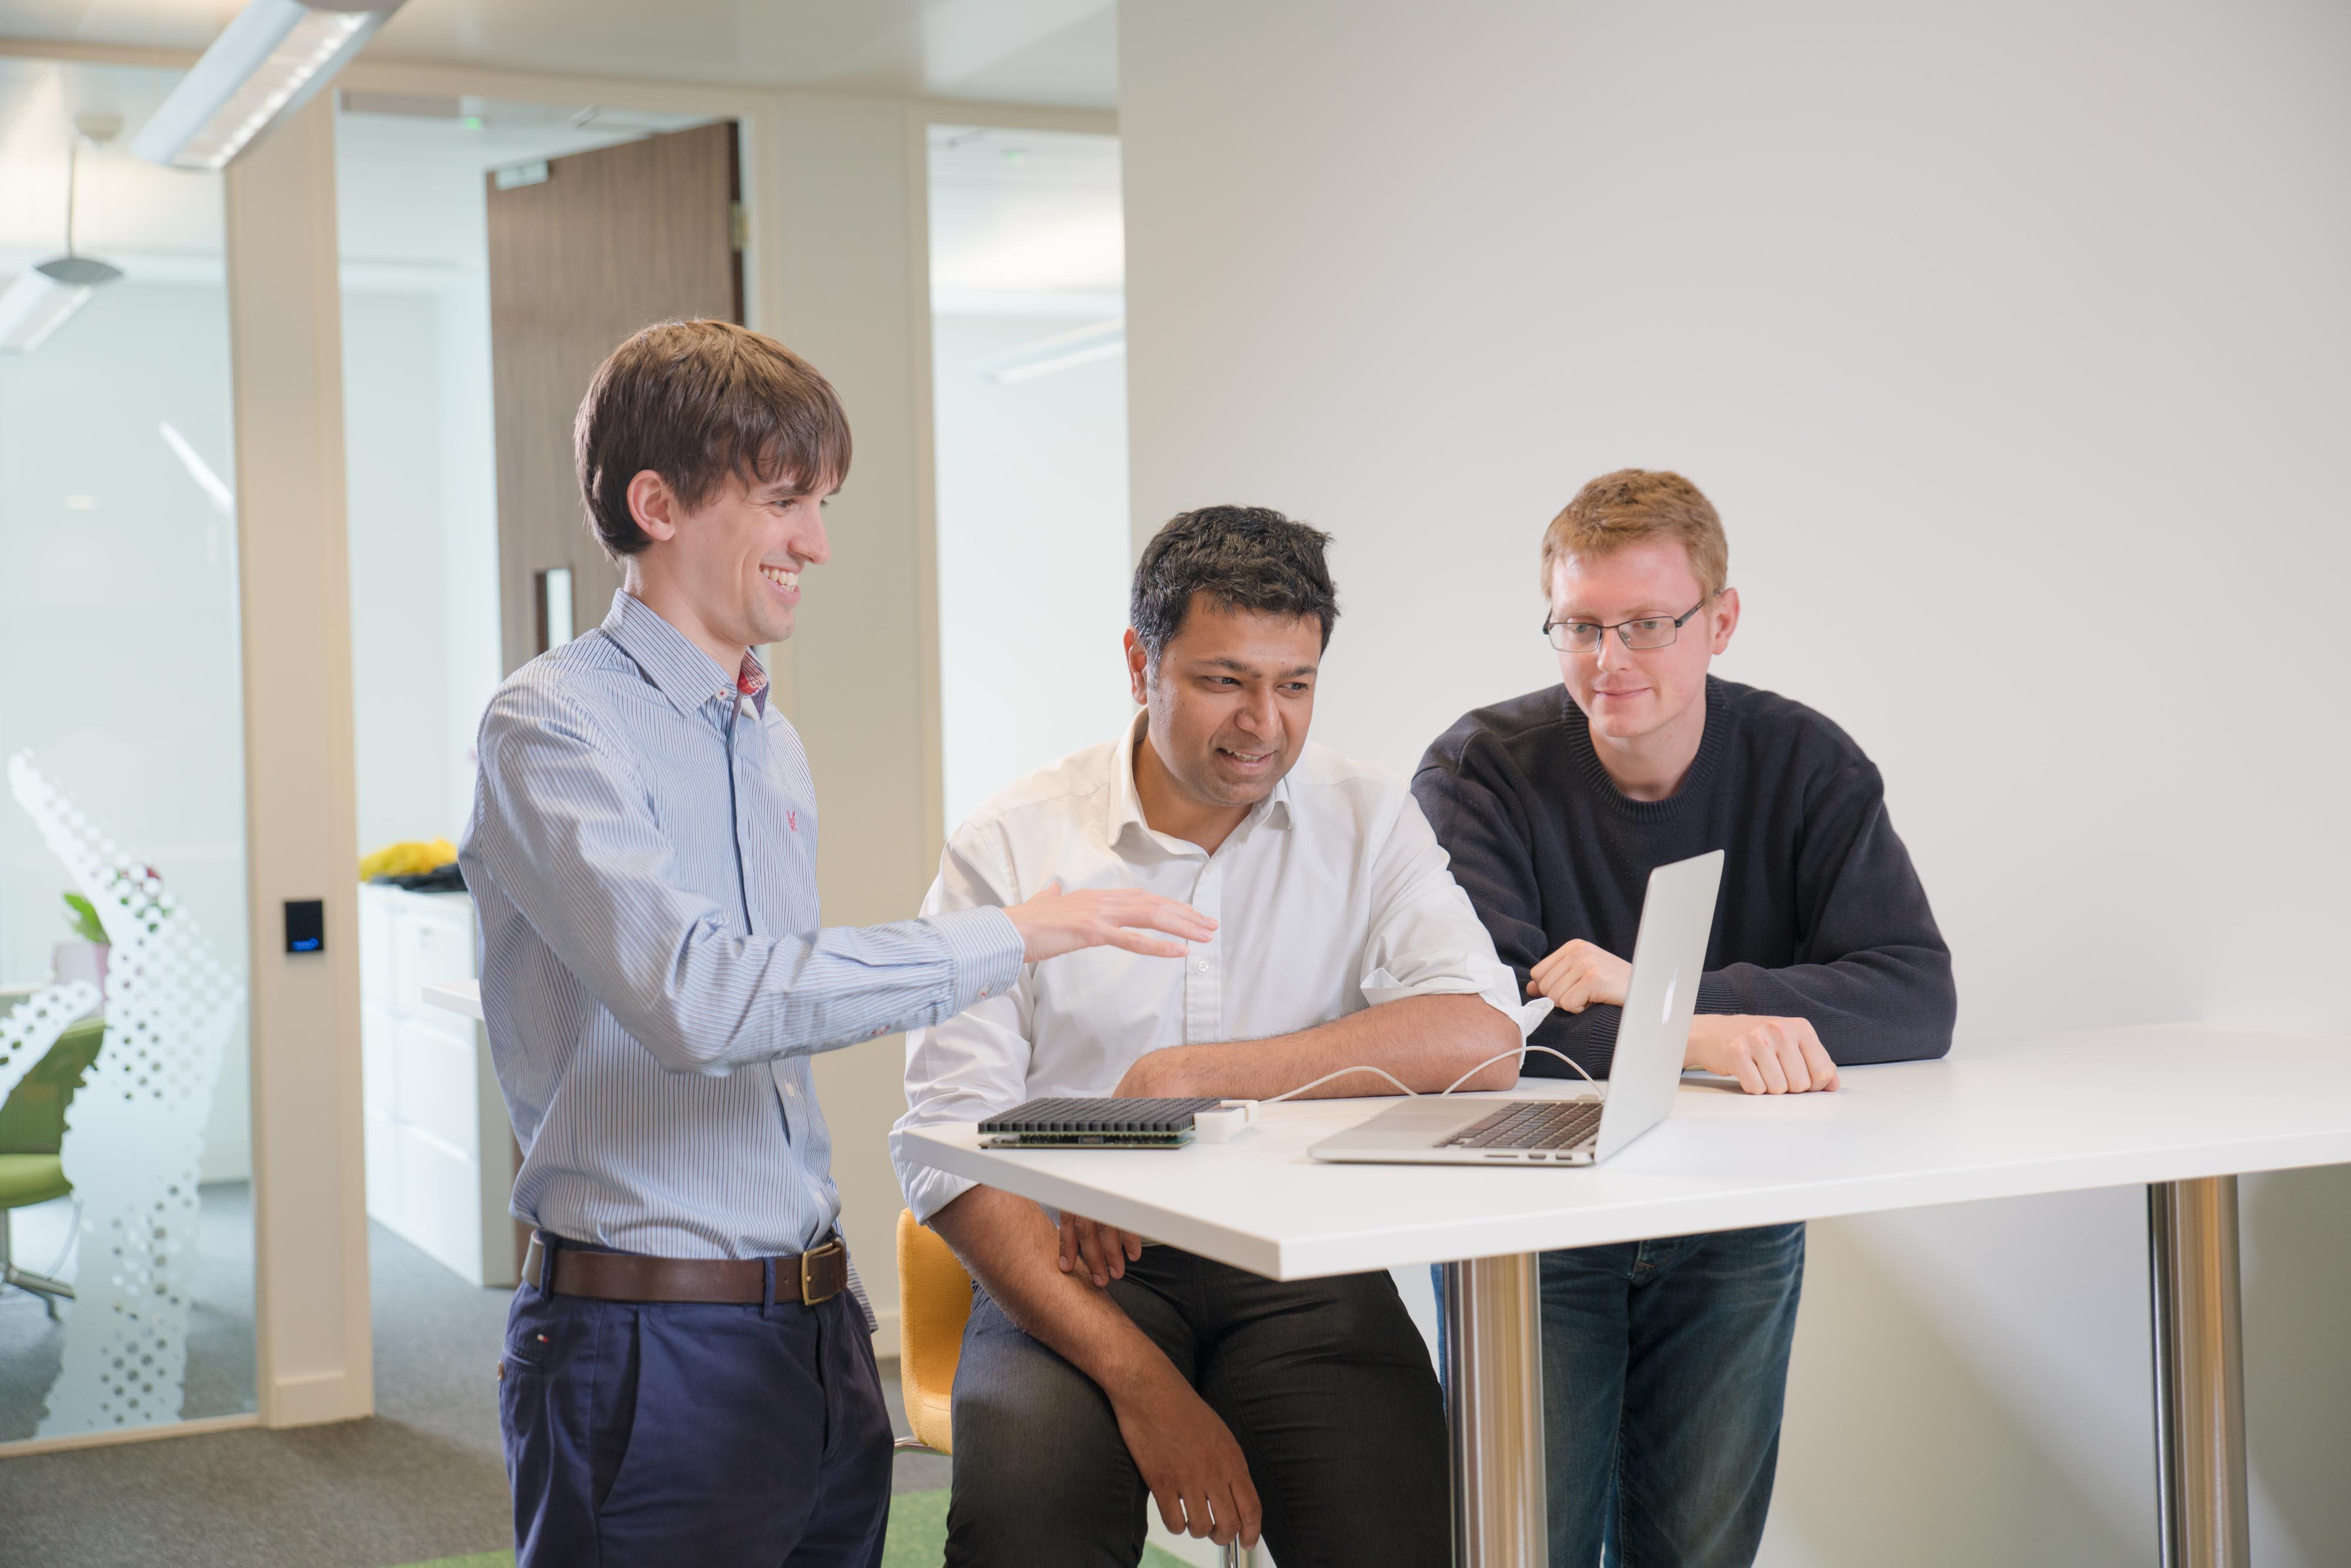 Ultrahaptics team photographed at their HQ in Bristol  Pic - Gareth Iwan Jones